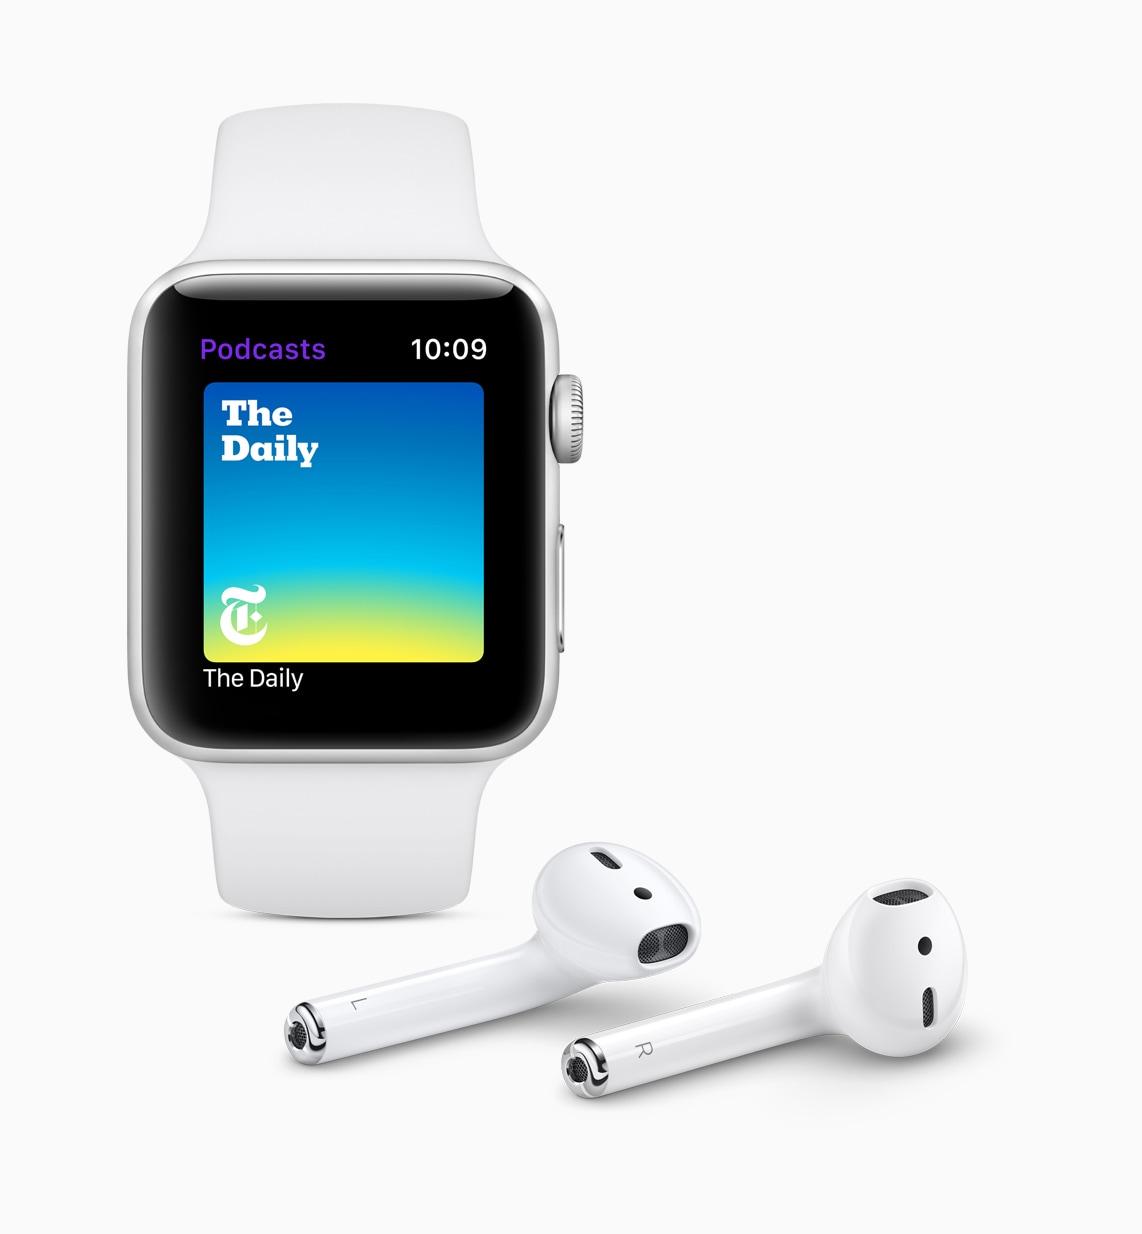 Apple-watchOS_5-Podcasts-screen-06042018.jpg